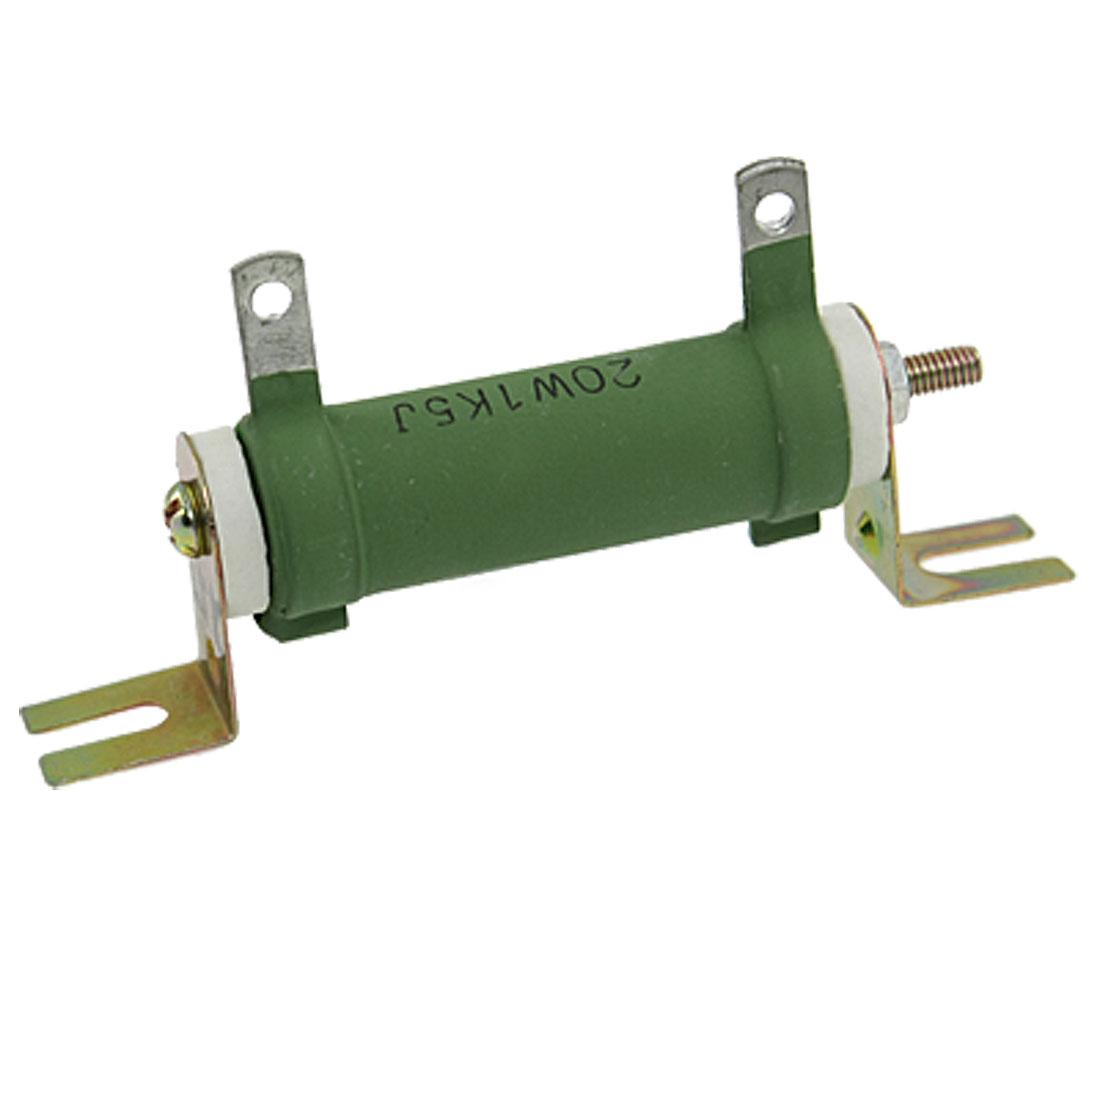 Nonflammable 20W Watt 1K5 1.5K Ohm 5% Ceramic Tube Resistor